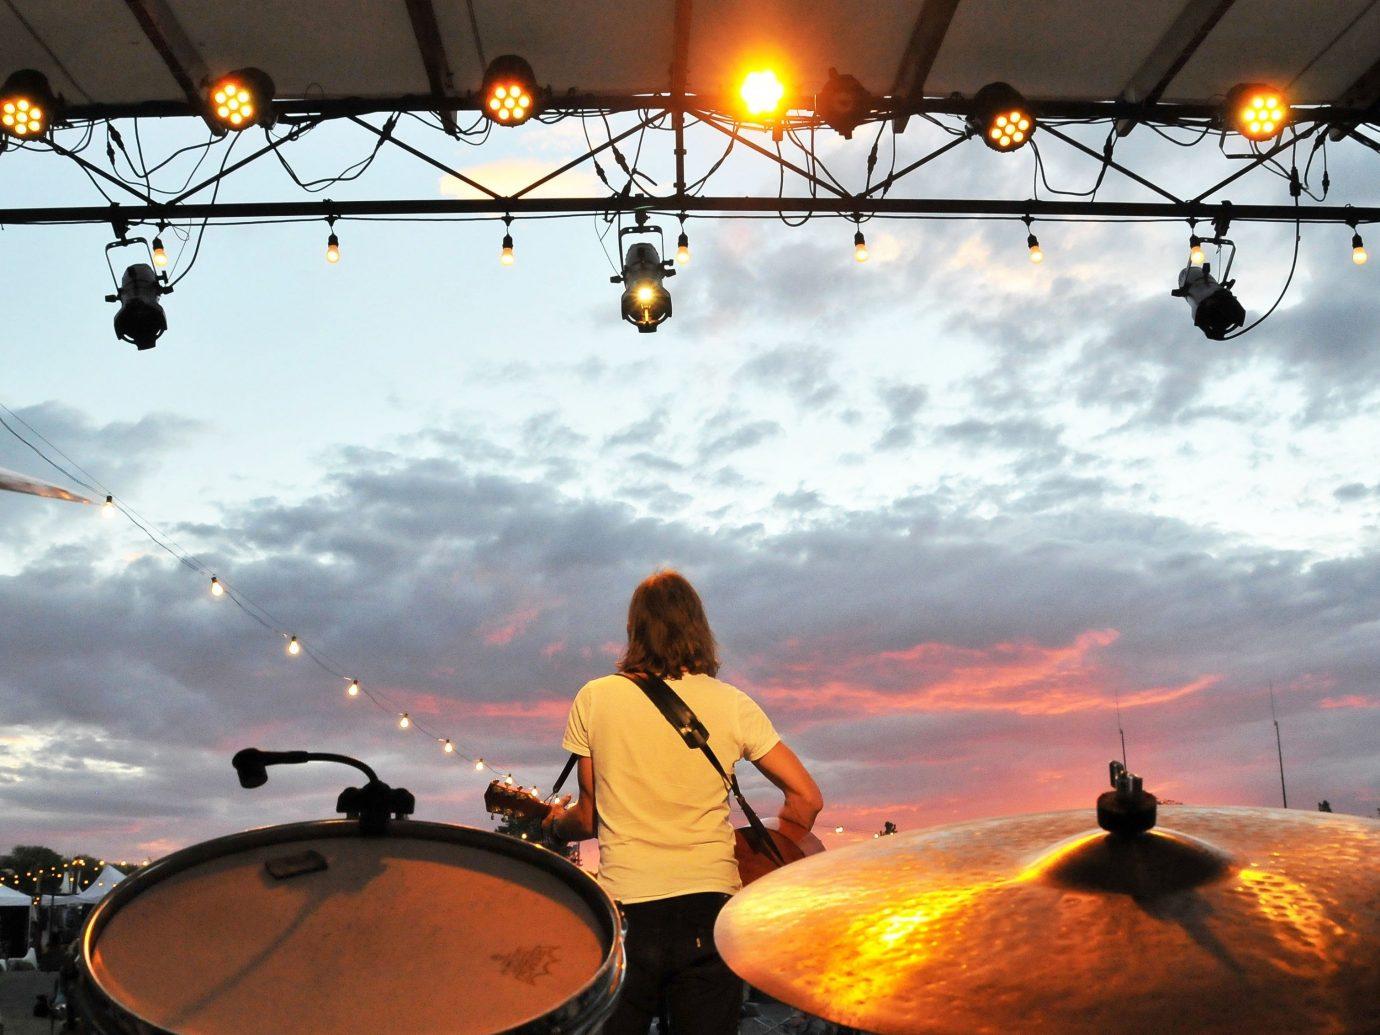 Arts + Culture sky outdoor light traffic drums drum drummer evening morning musician skin head percussion instrument sunlight